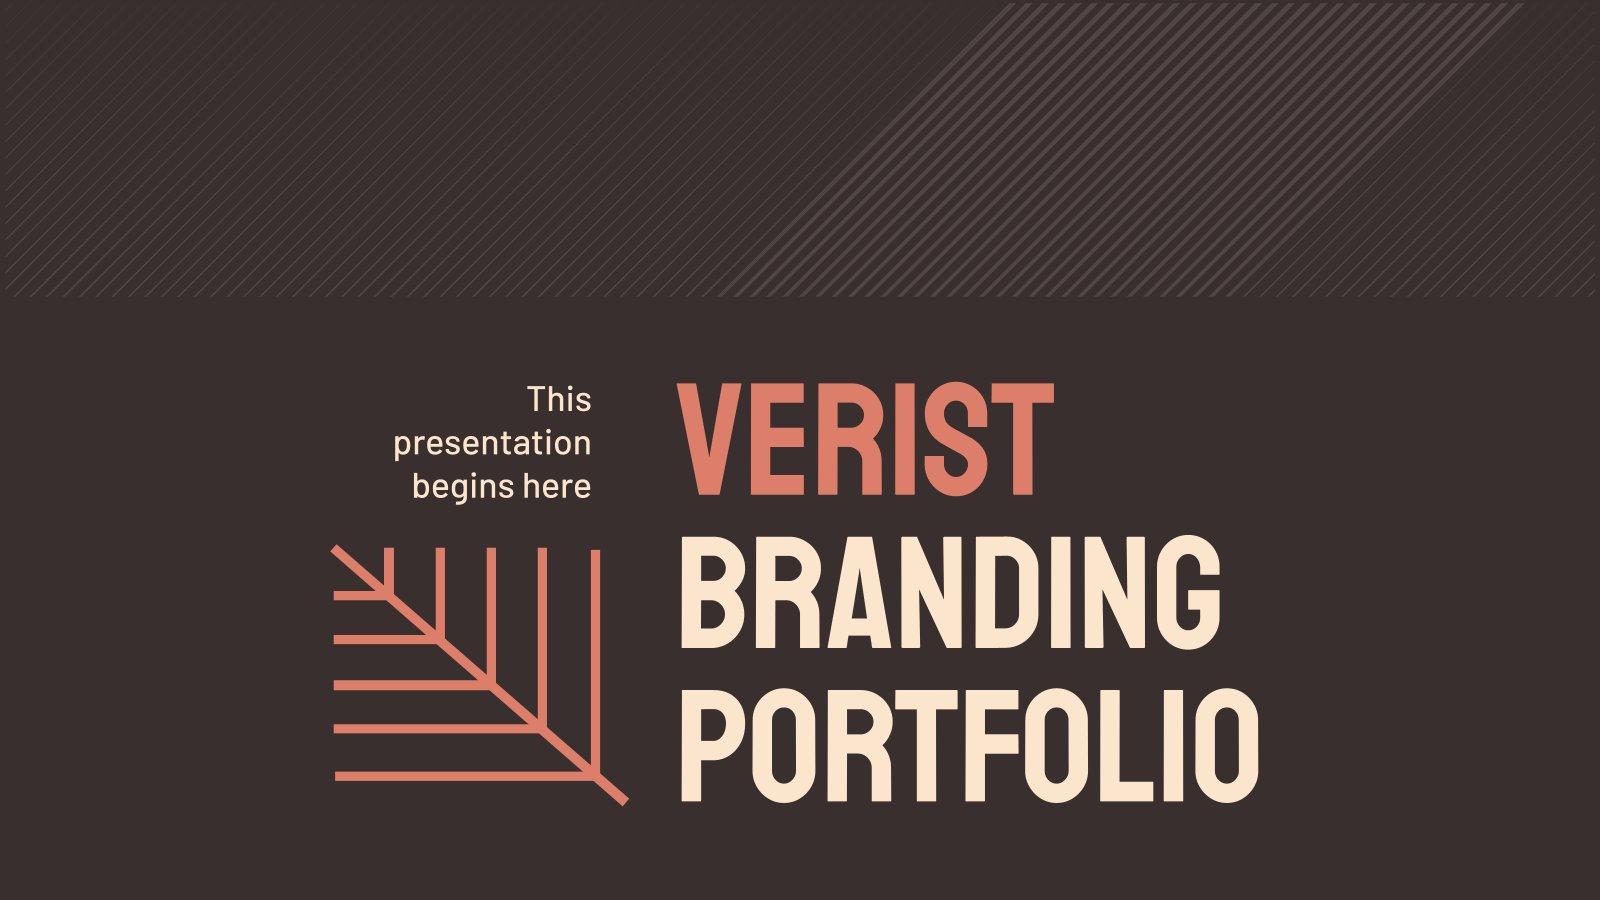 Verist Branding Portfolio Präsentationsvorlage